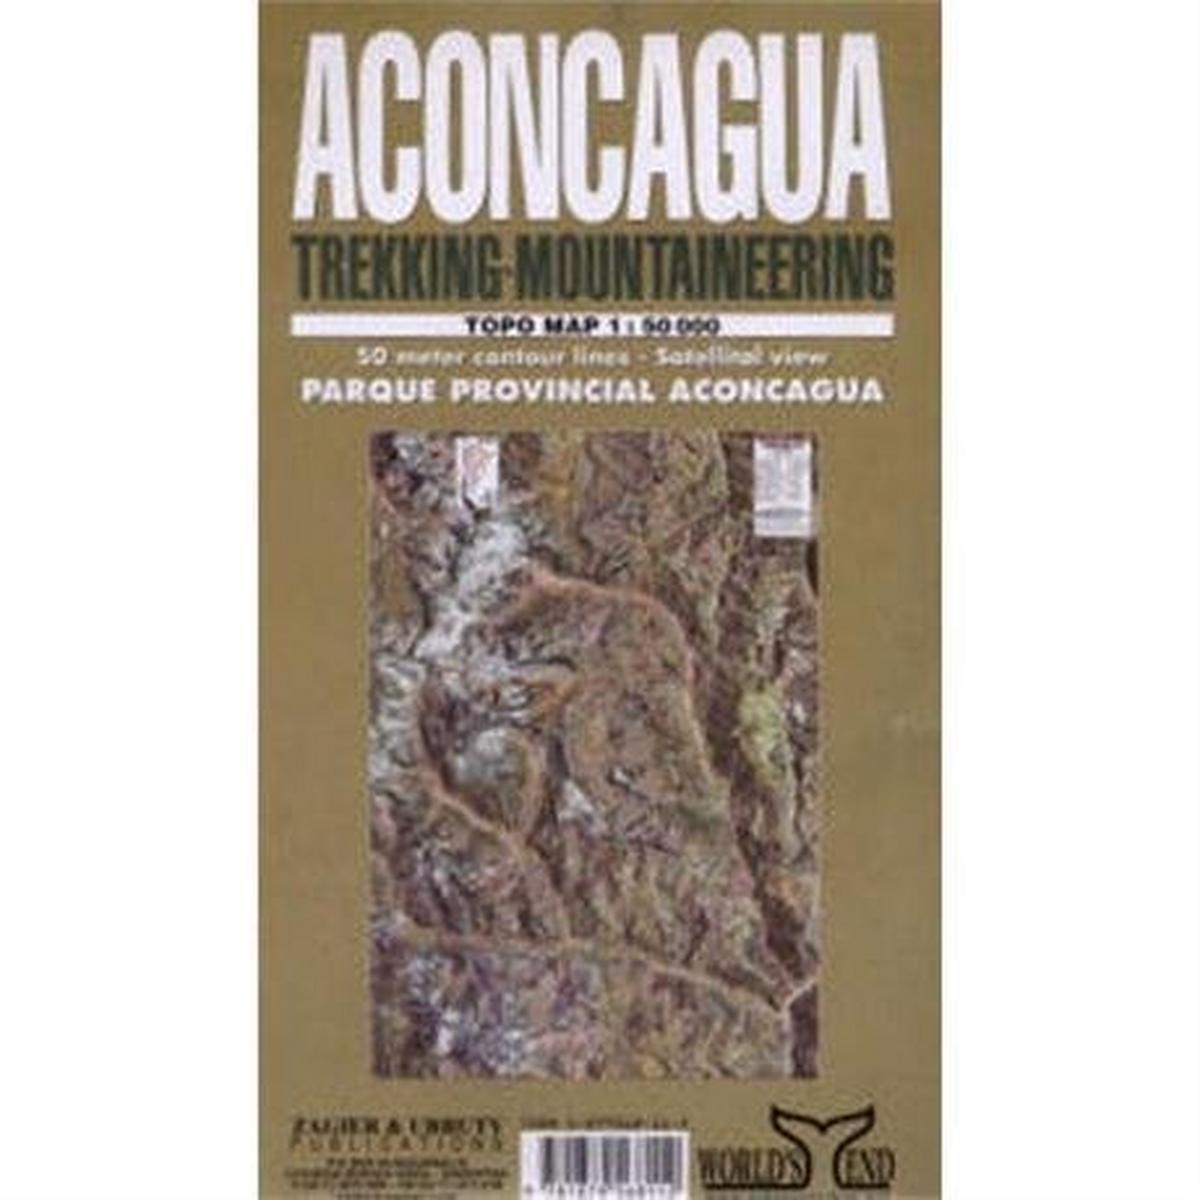 Miscellaneous Argentina Map: Aconcagua Trekking - Mountaineering 1:50,000